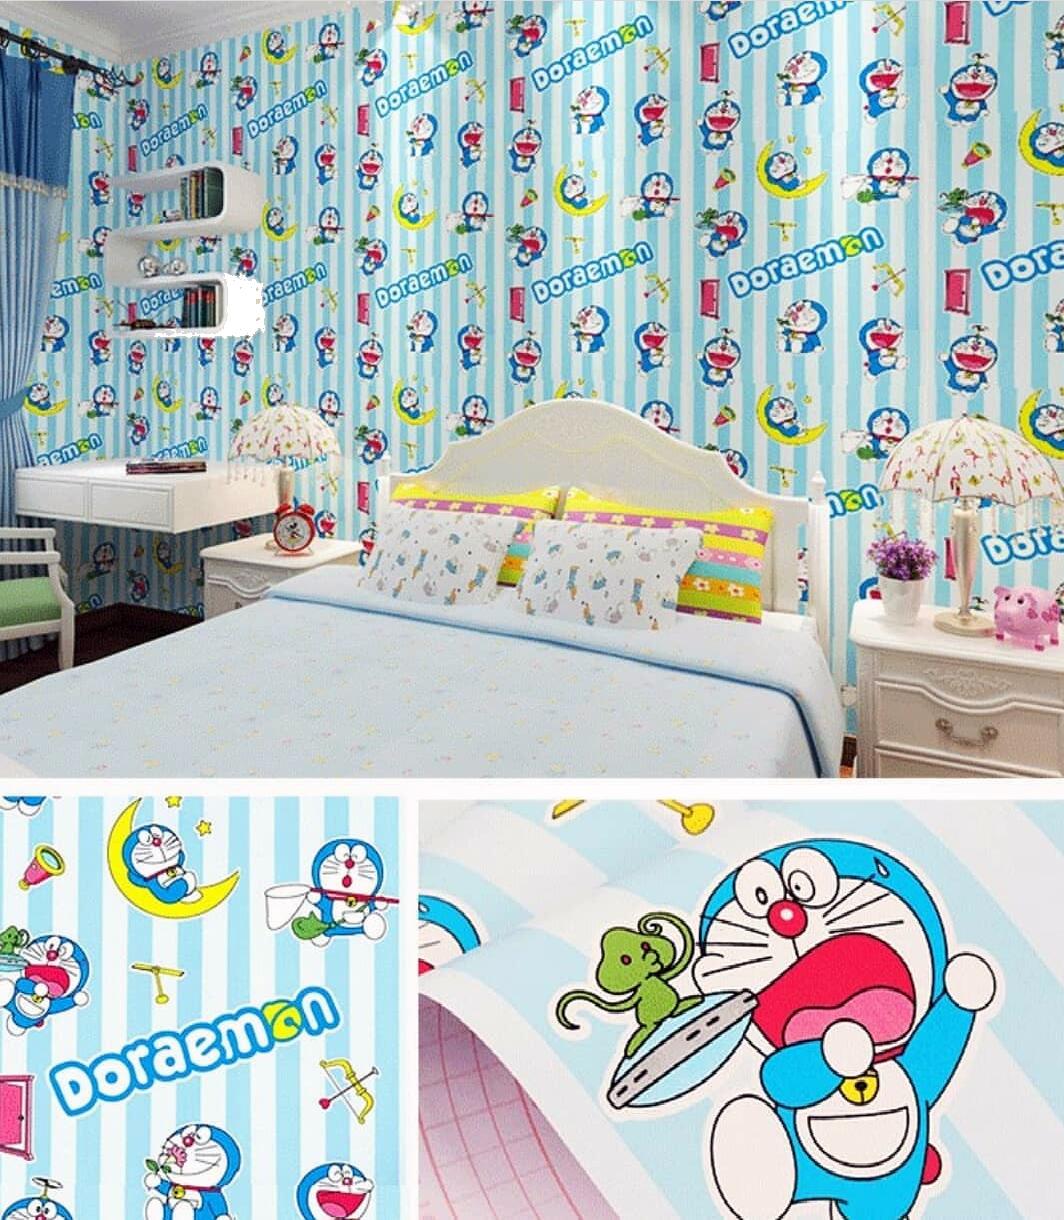 Cod Bayar Ditempat Wallpaper Stiker Dinding Size 45cm X 10m